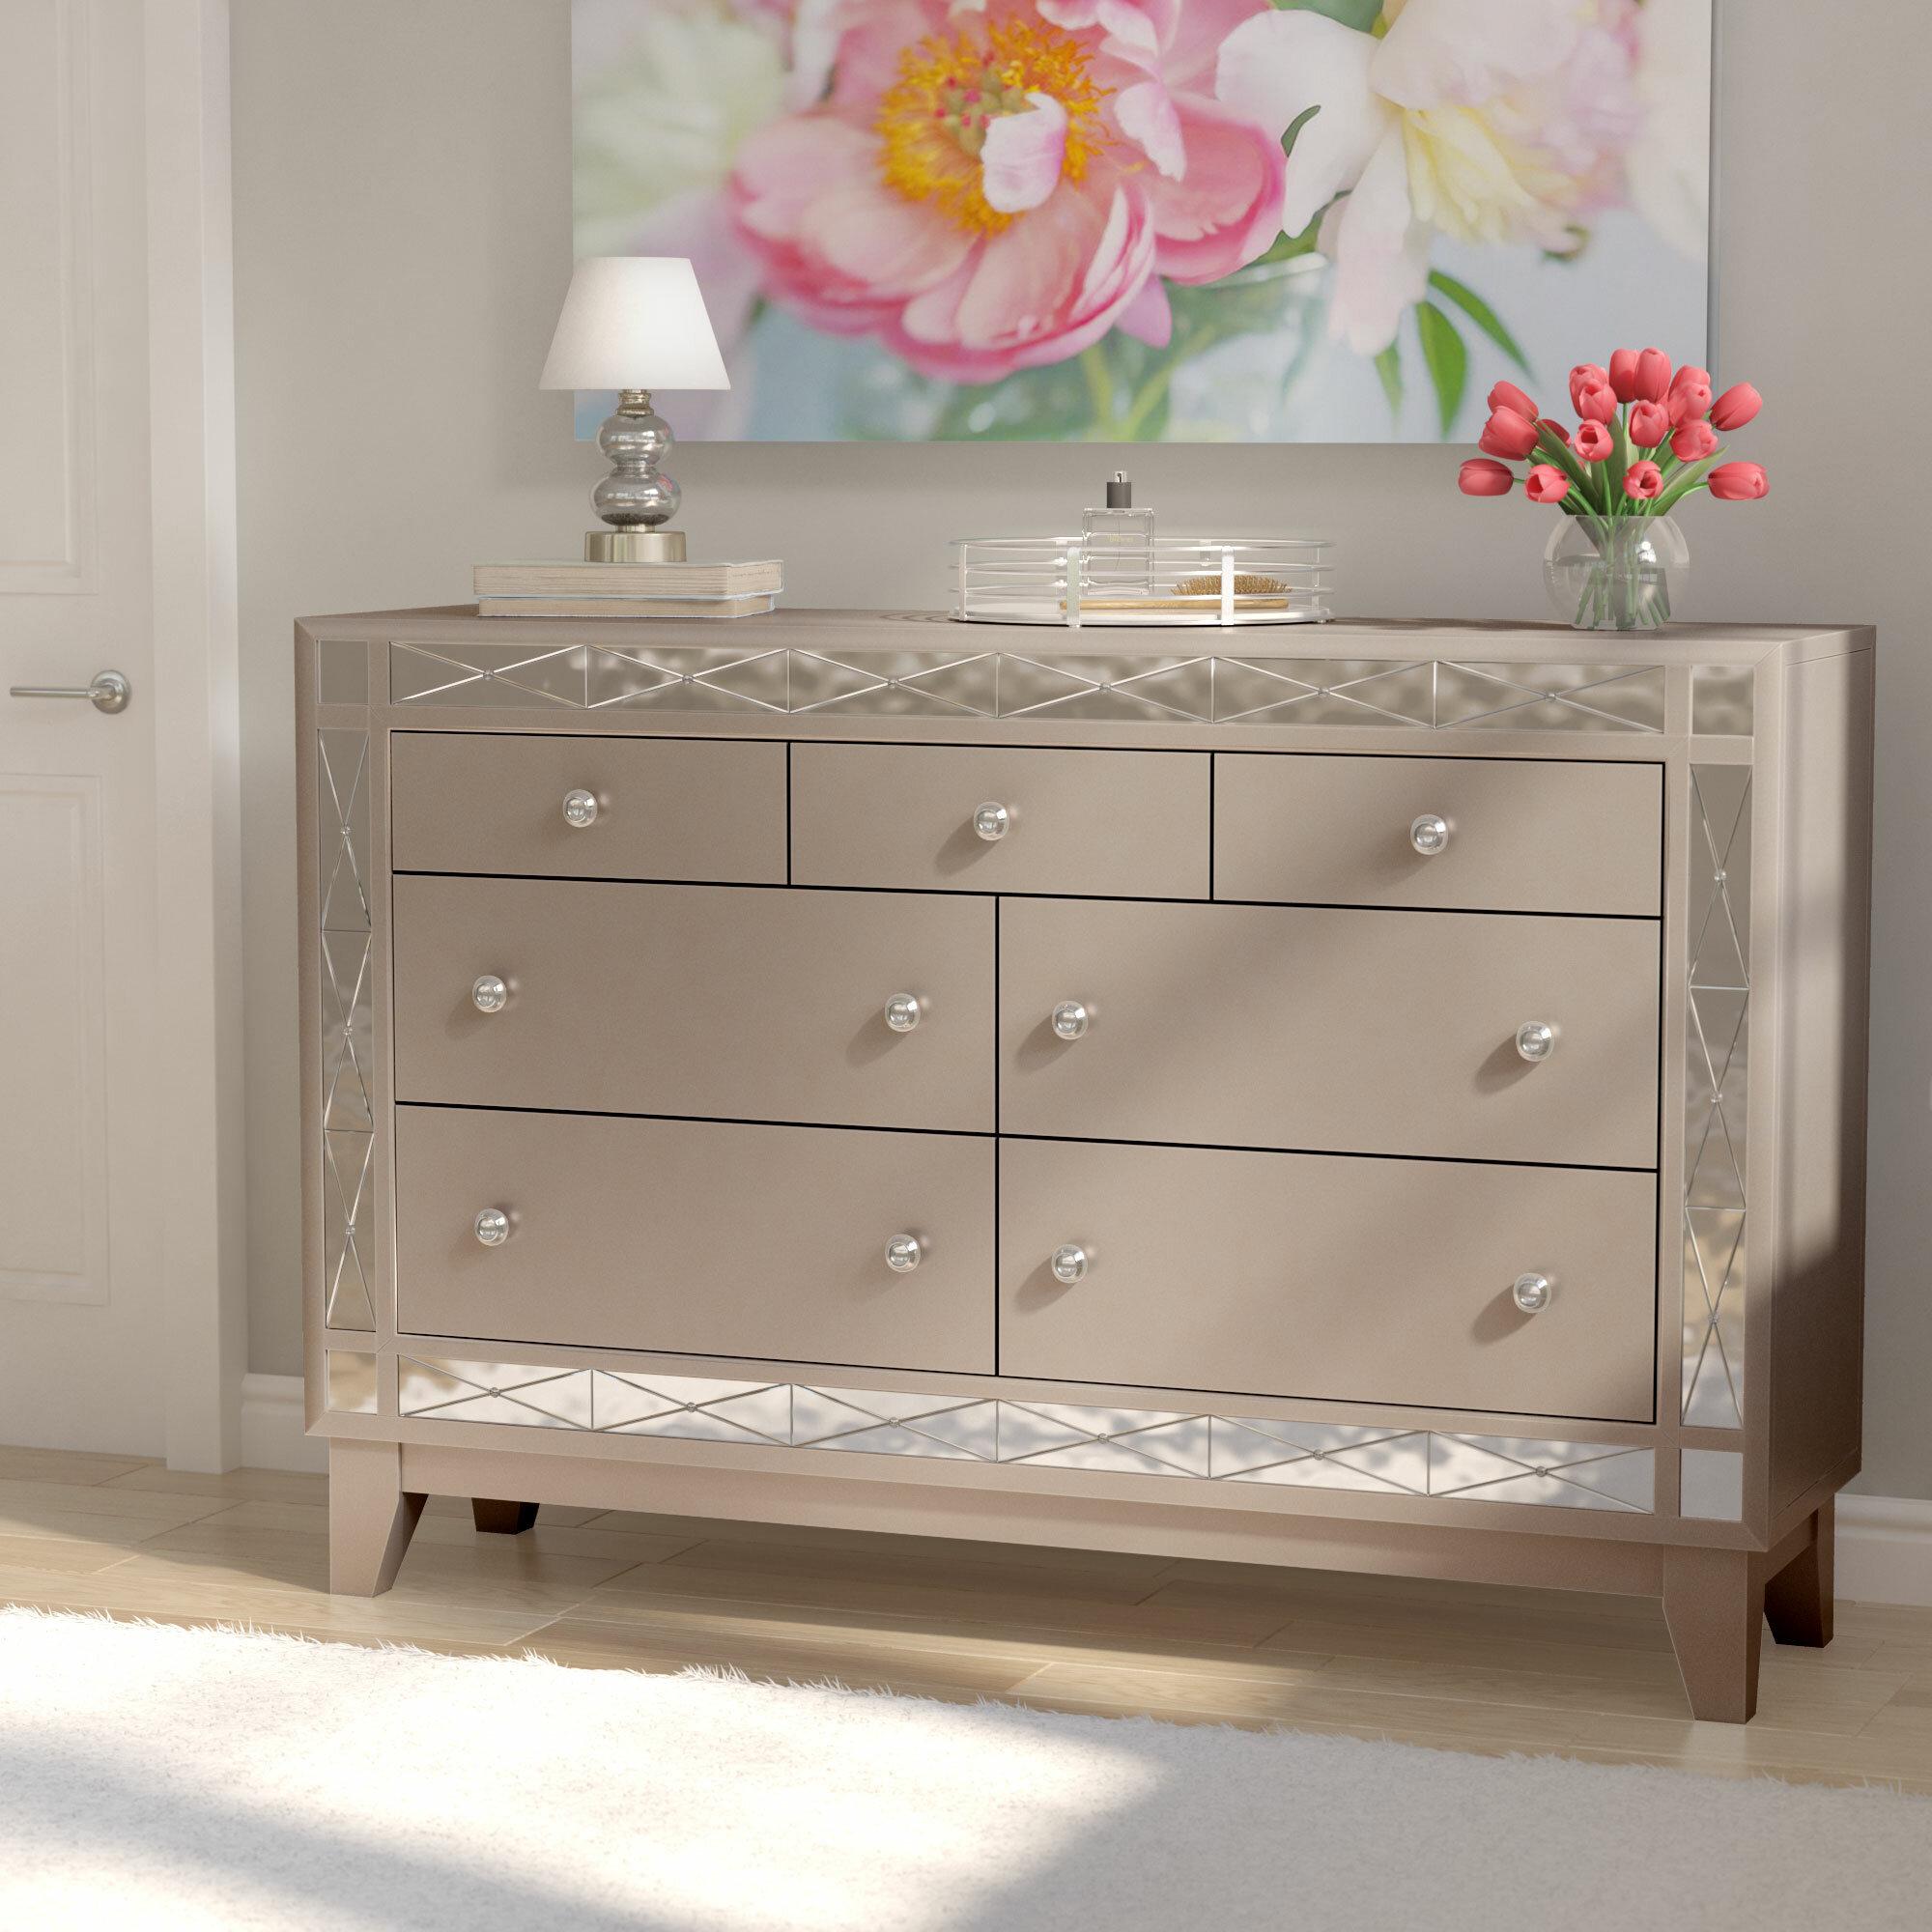 Willa arlo interiors alessia 7 drawer dresser reviews wayfair